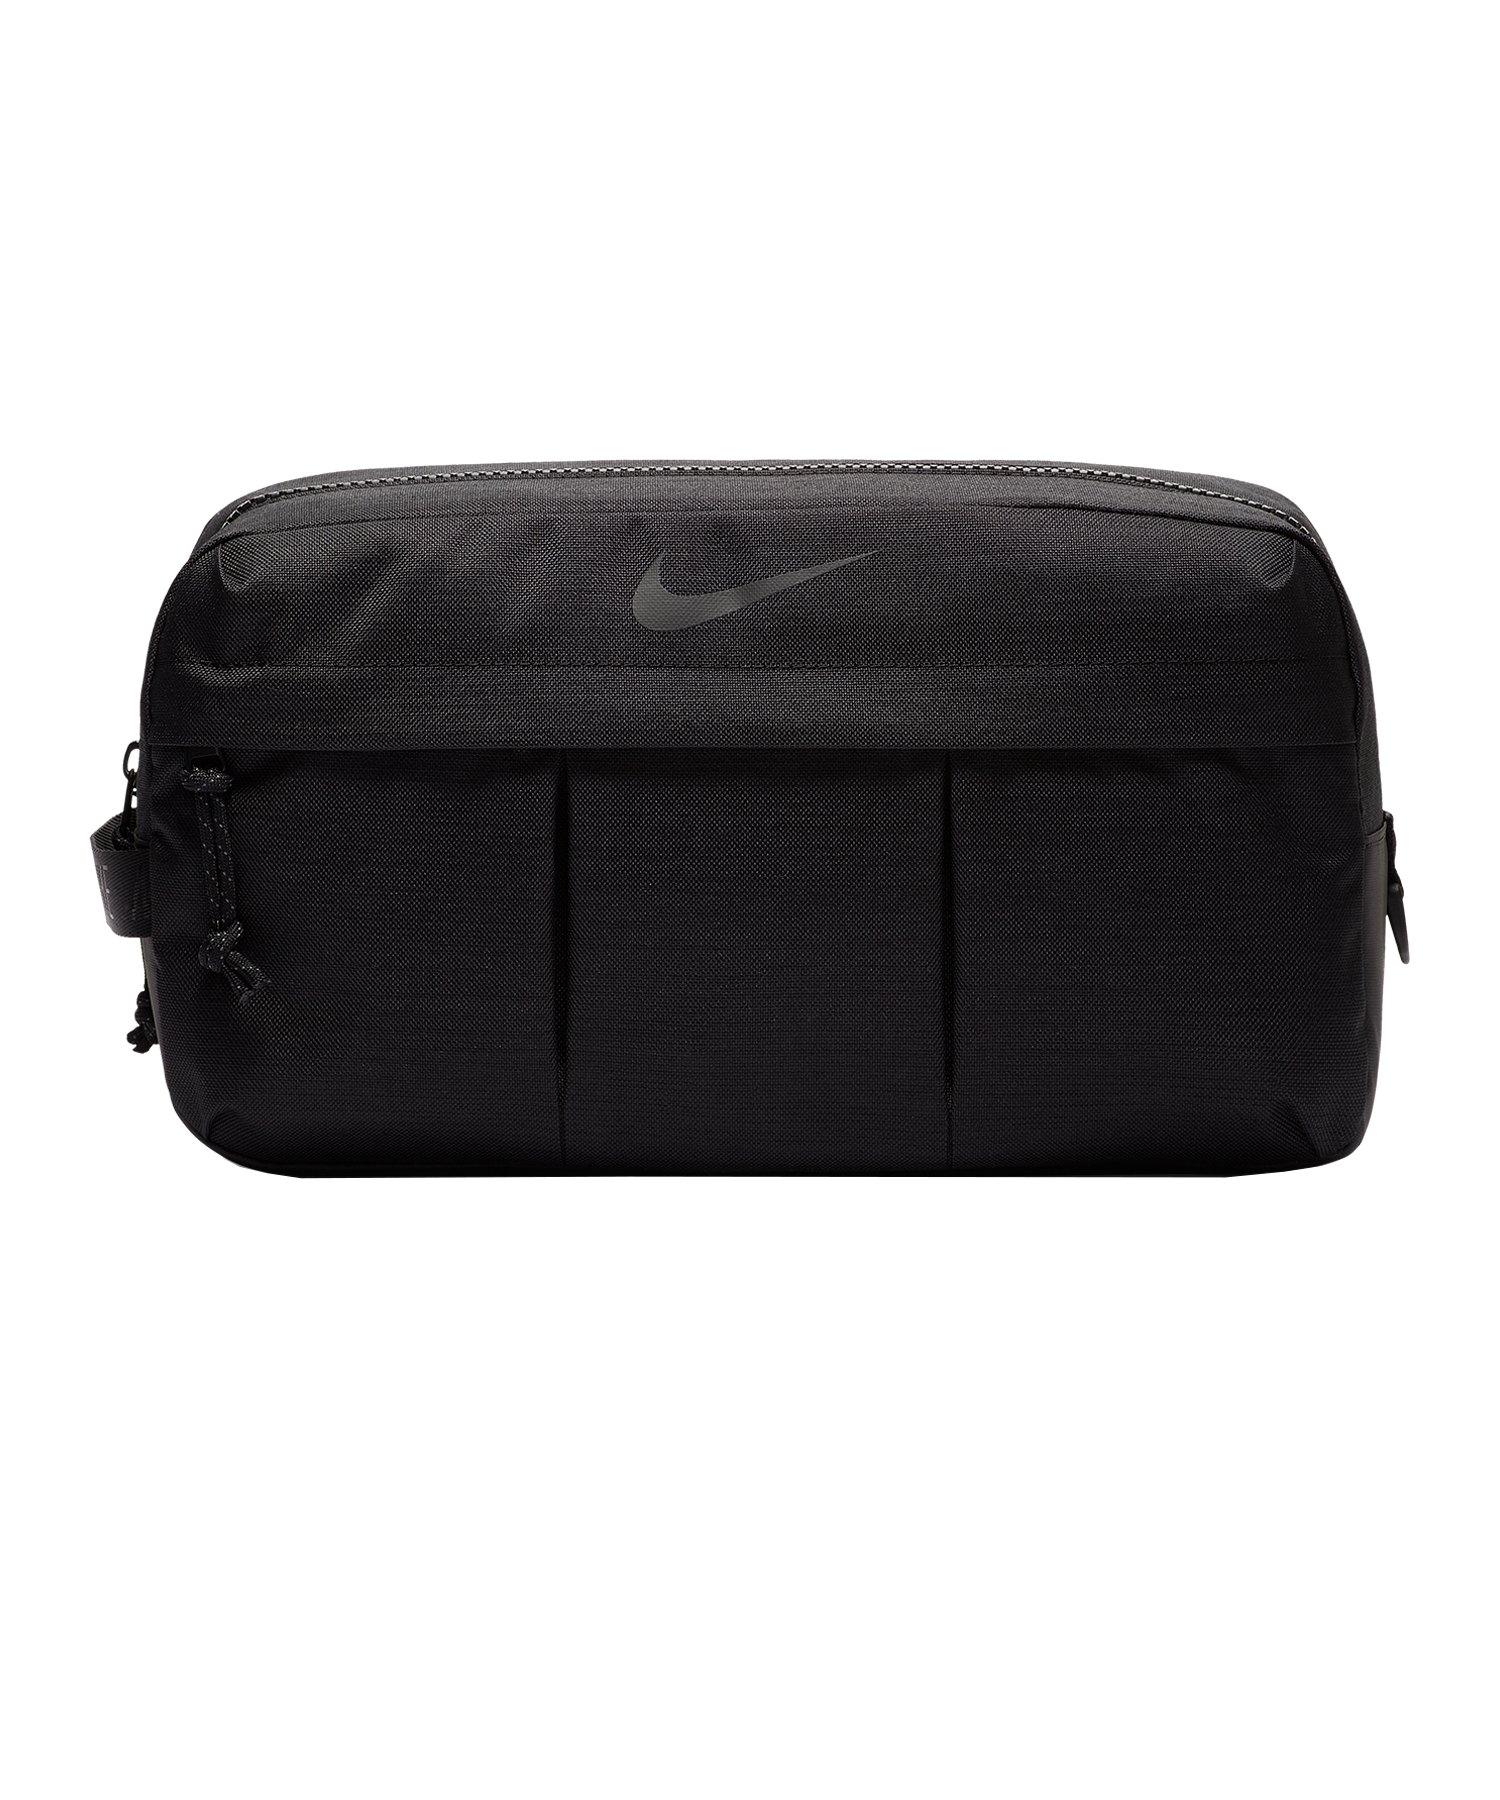 Nike Vapor Shoe Bag Schuhtasche Schwarz F010